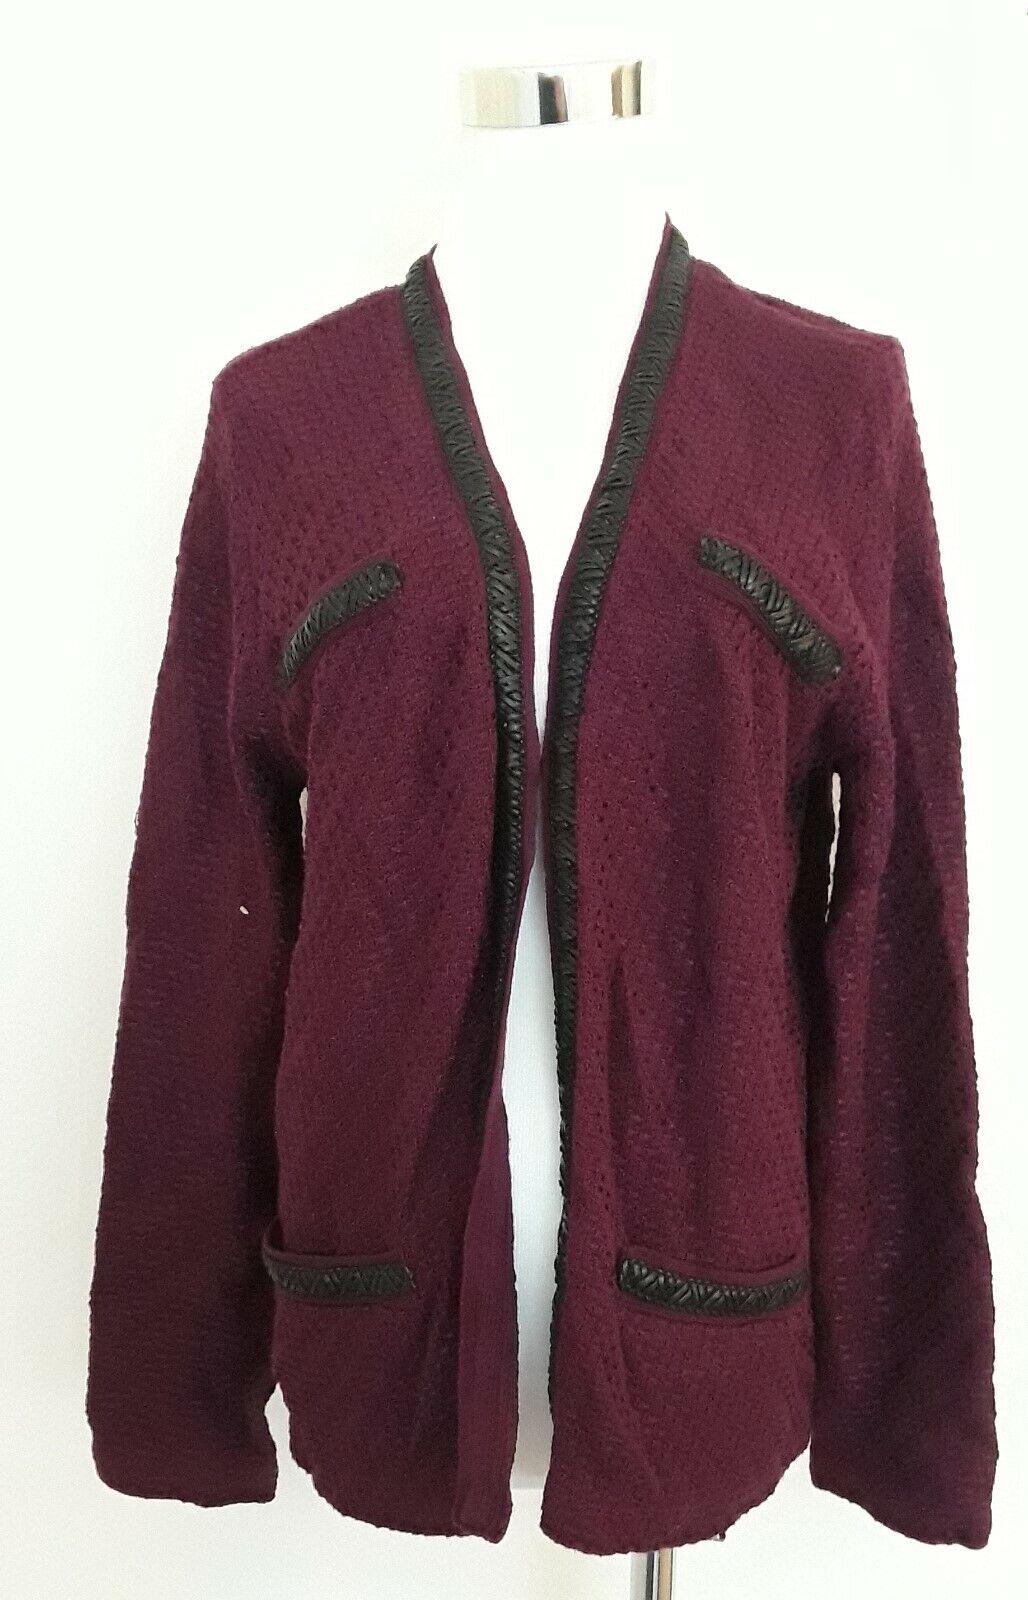 Jons New York Cardigan Faux Leather Trim Long Sleeve Plum Wine XL